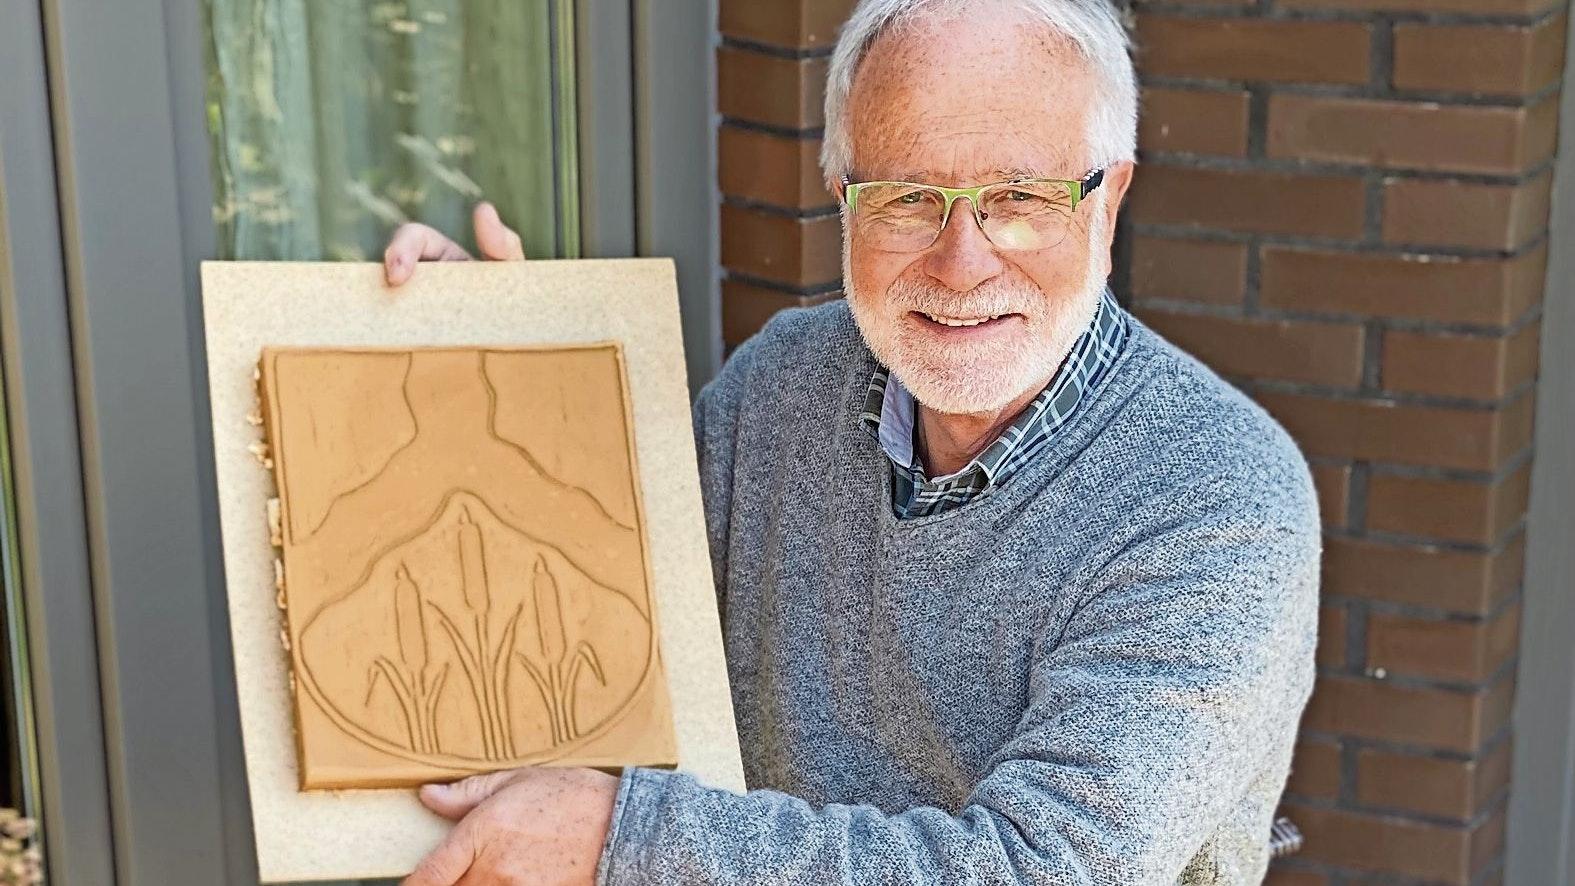 Mit dem Neuscharreler Wappen: Herbert Bley zeigt die Tontafel, die noch gebrannt werden muss. Foto: Claudia Wimberg